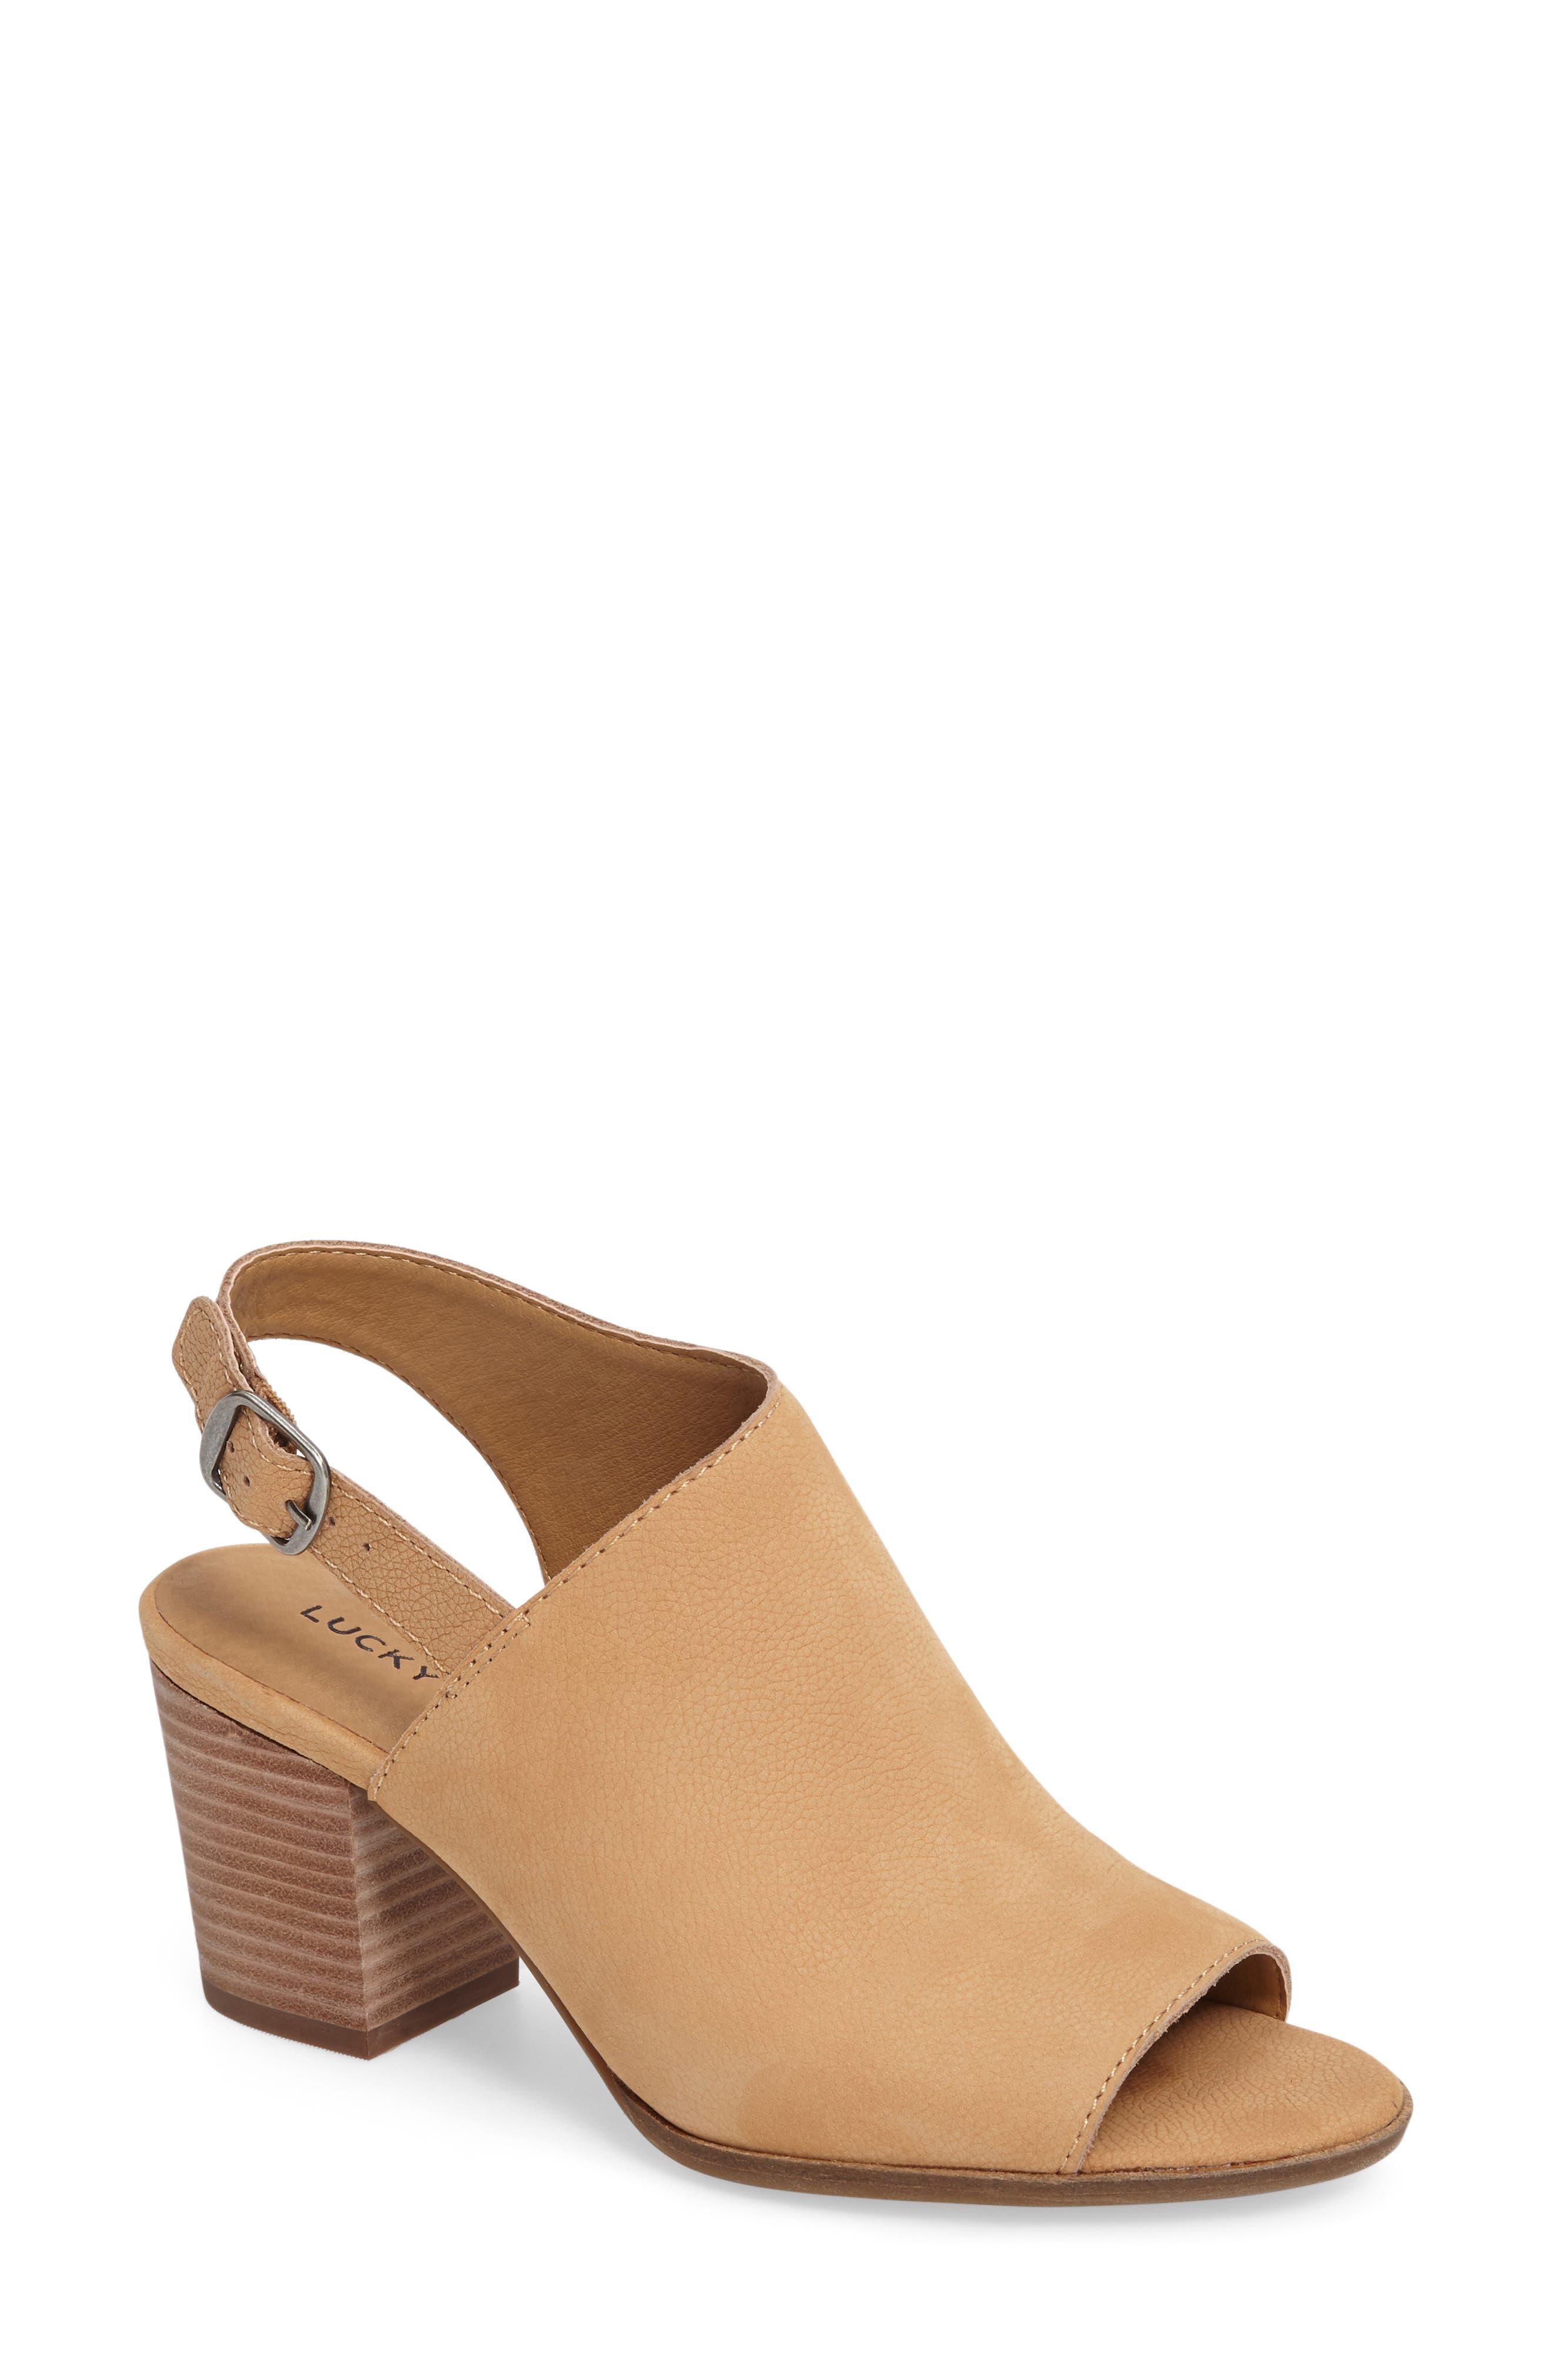 Main Image - Lucky Brand Obelia Block Heel Sandal (Women)